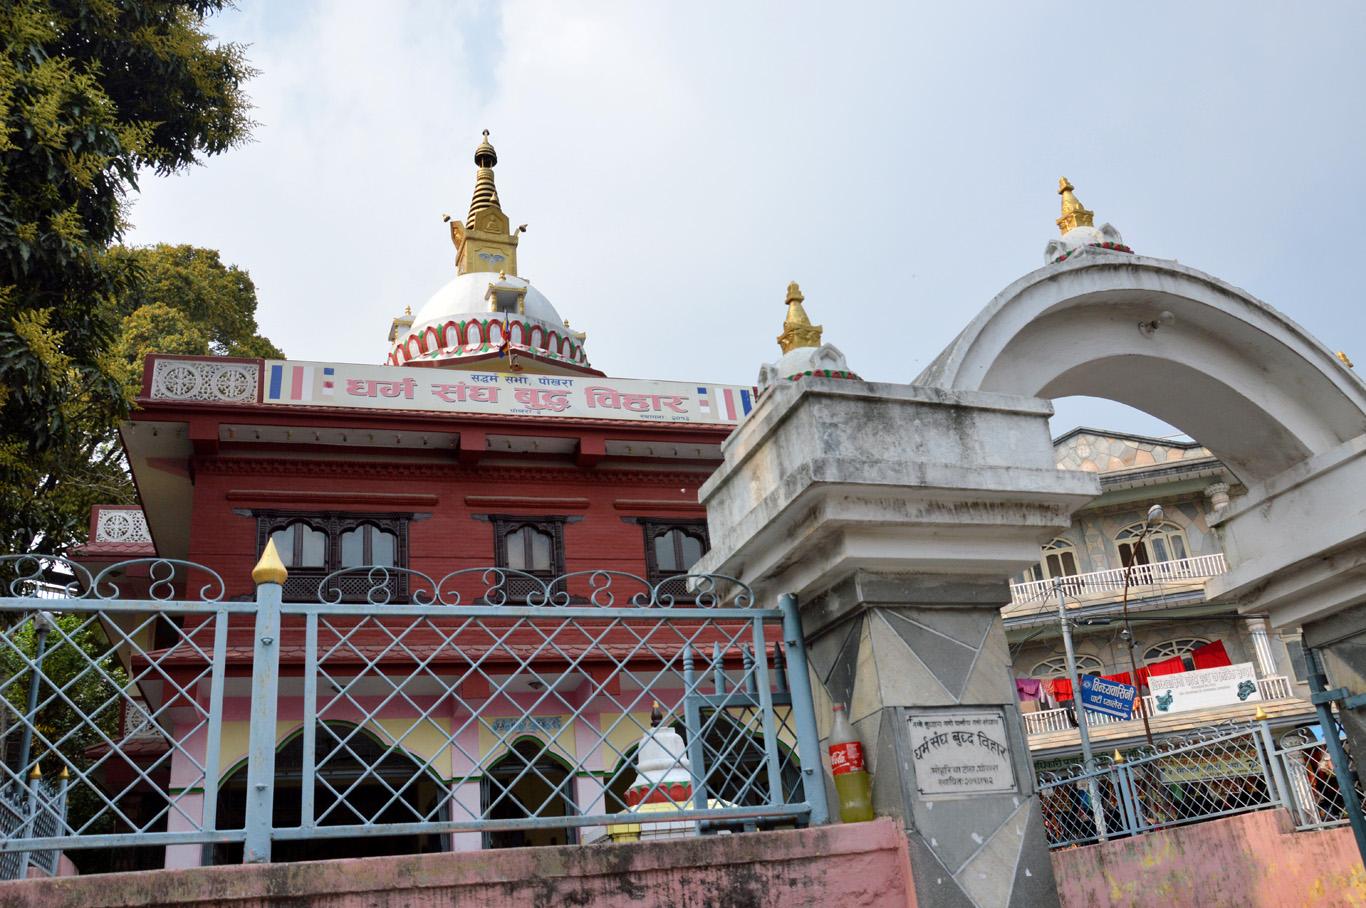 Entrance to Binhyabasini Temple